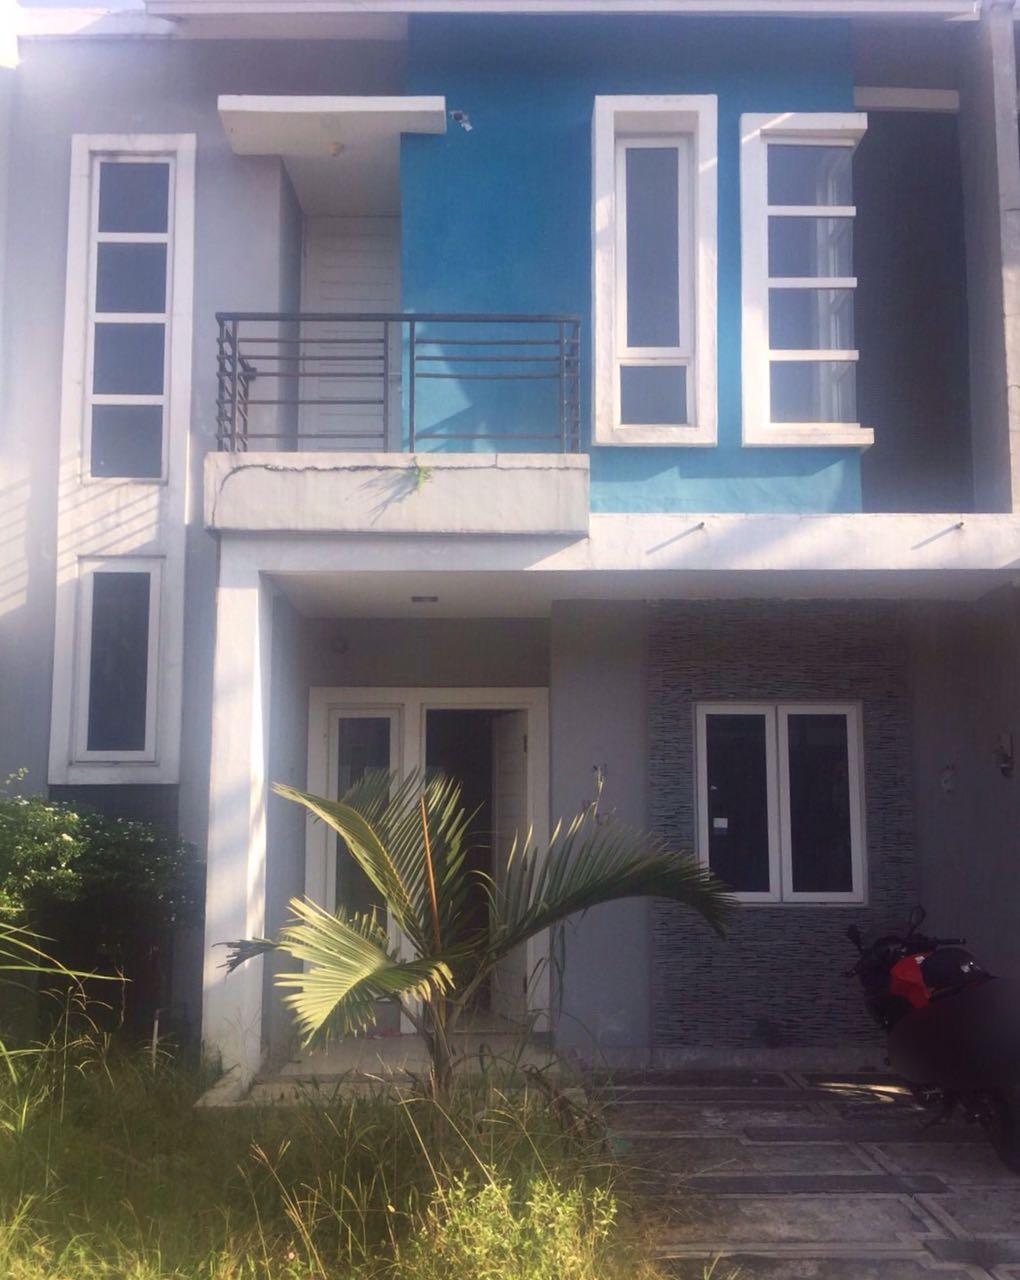 Rumah di  Villa Zeqita Jual Cepat Harga  670 juta Jln